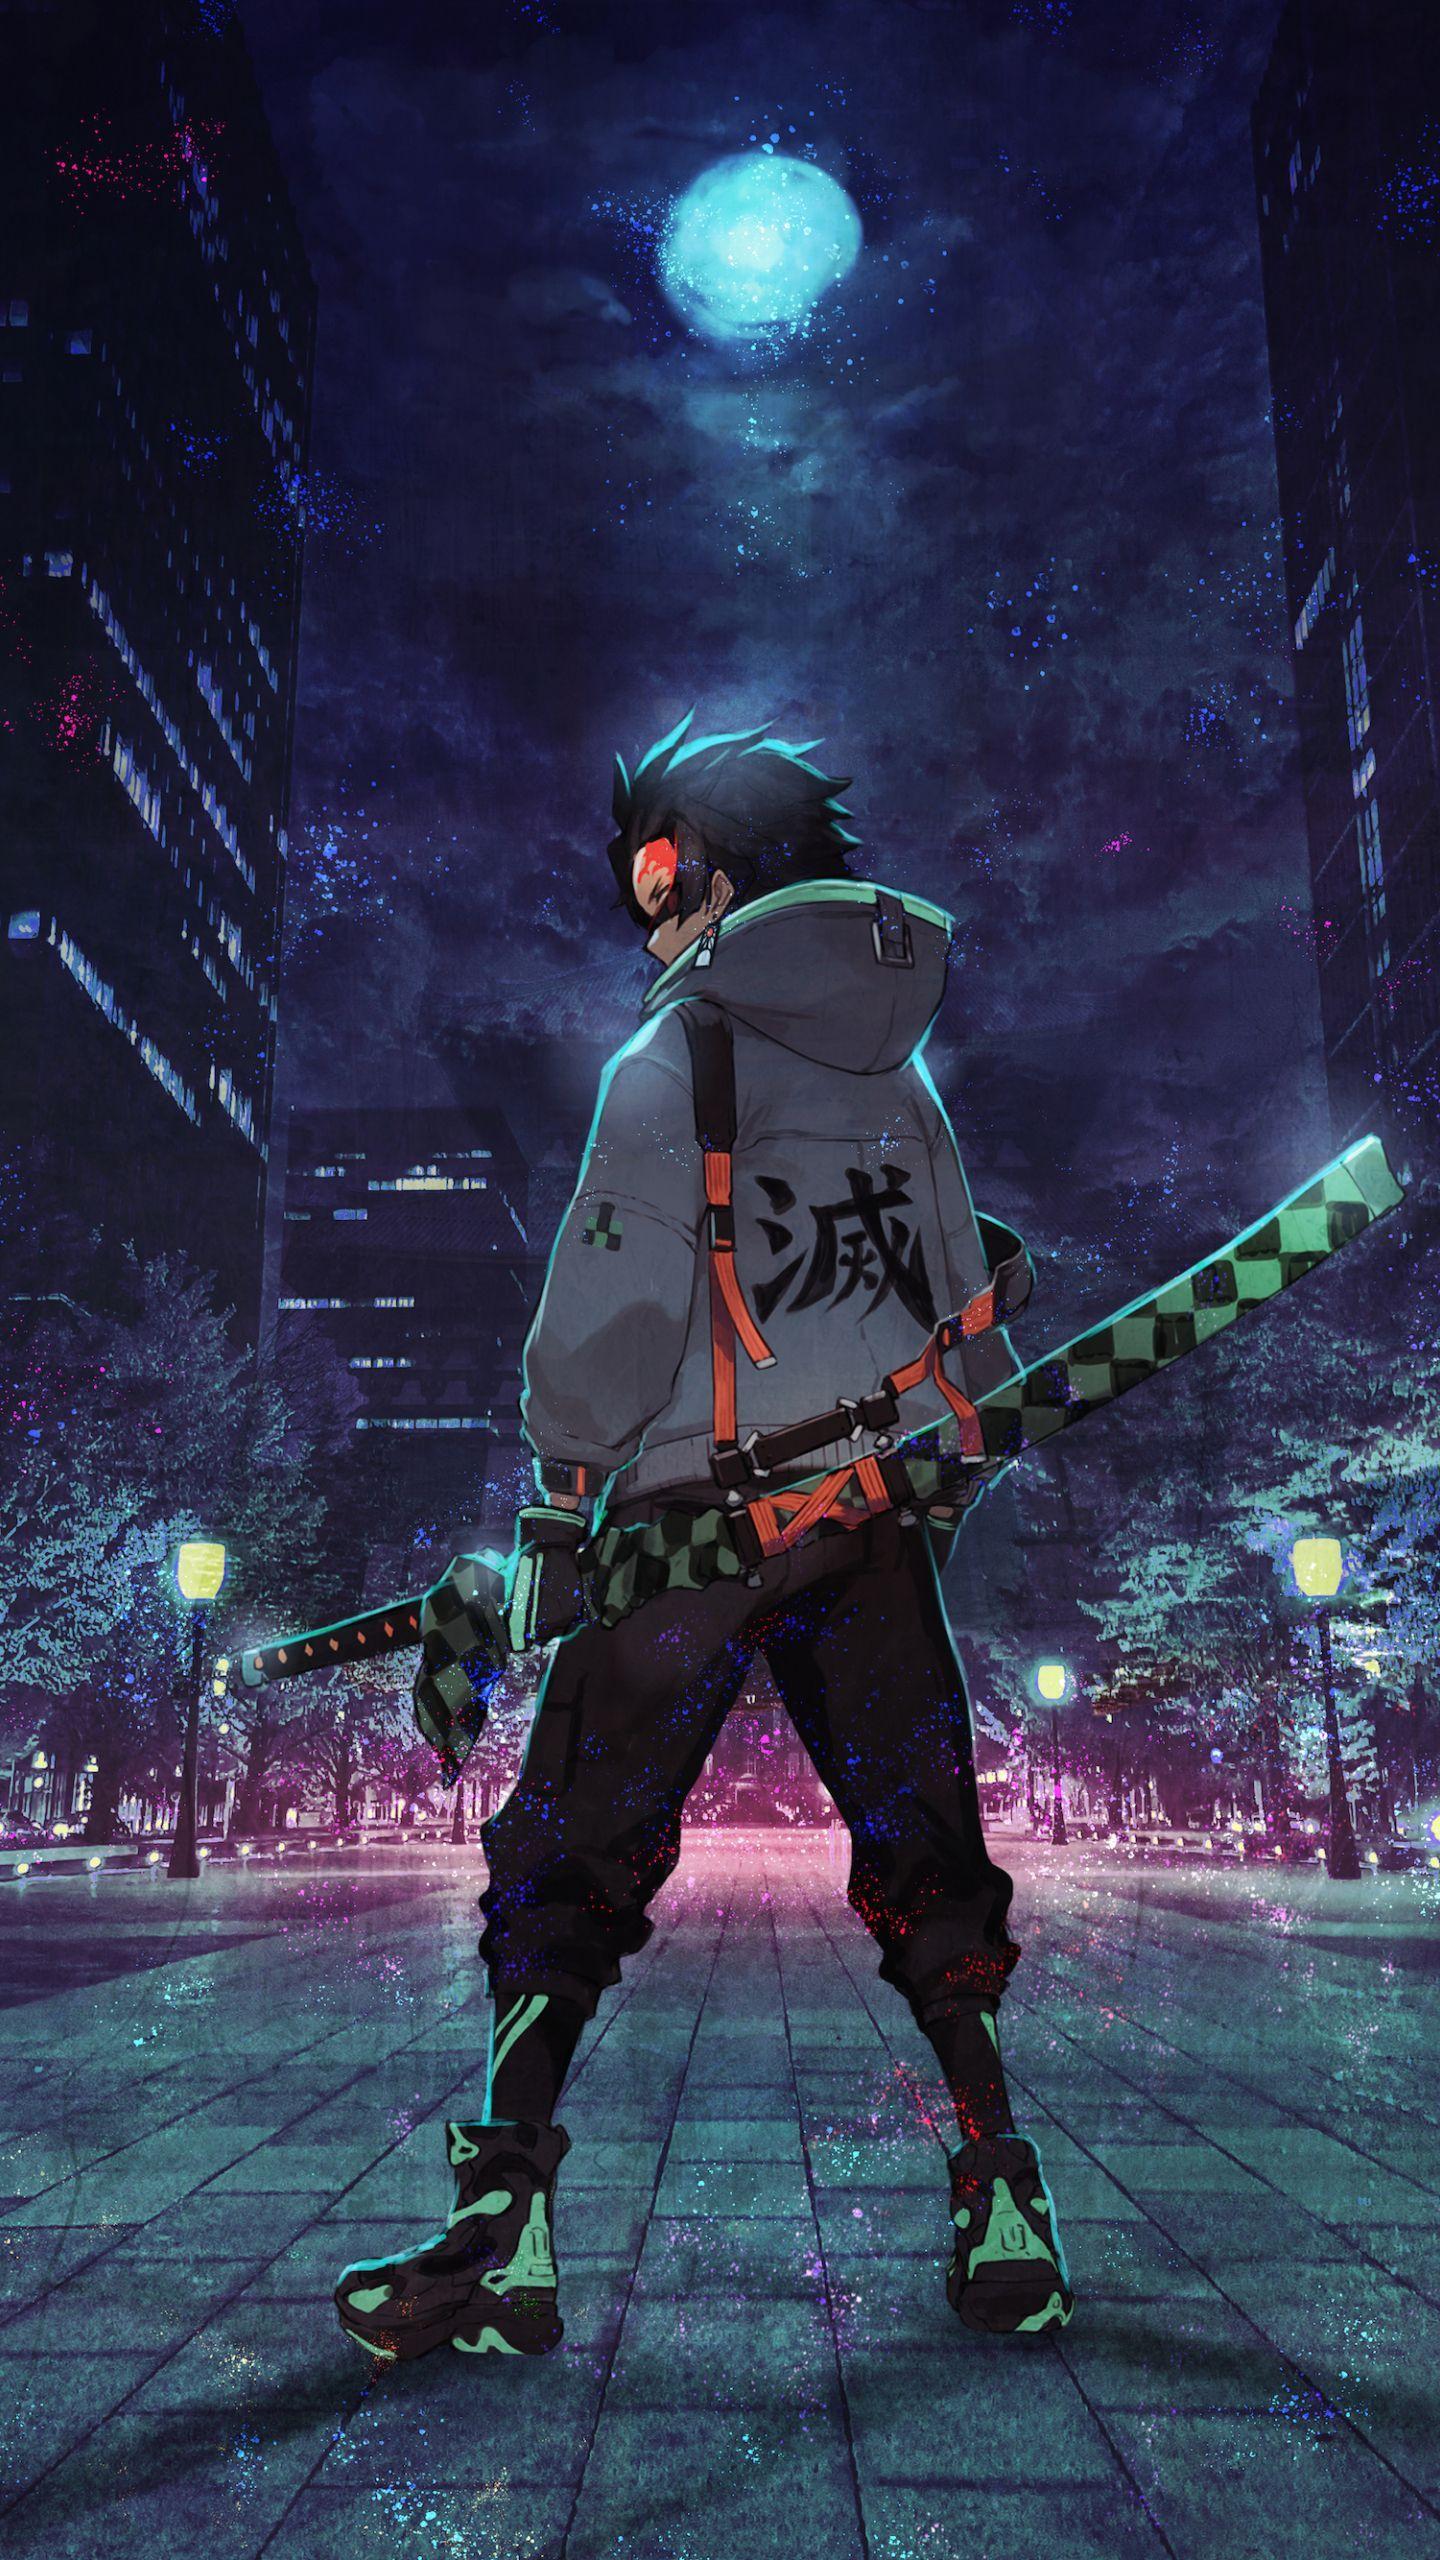 14402560 Urban ninja anime art wallpaper   rangekon 1440x2560